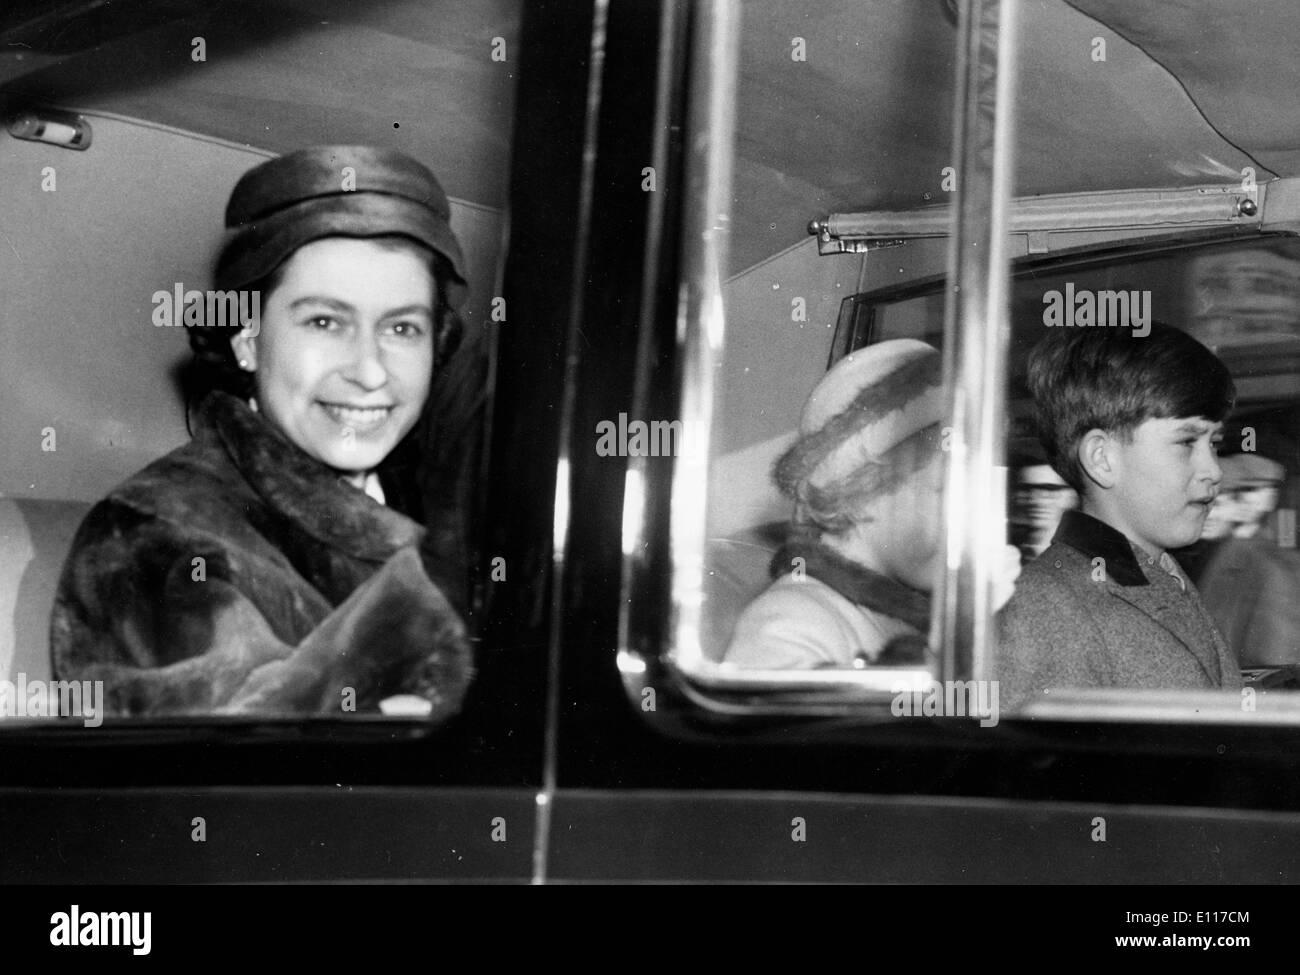 Queen Elizabeth II riding in car with children - Stock Image